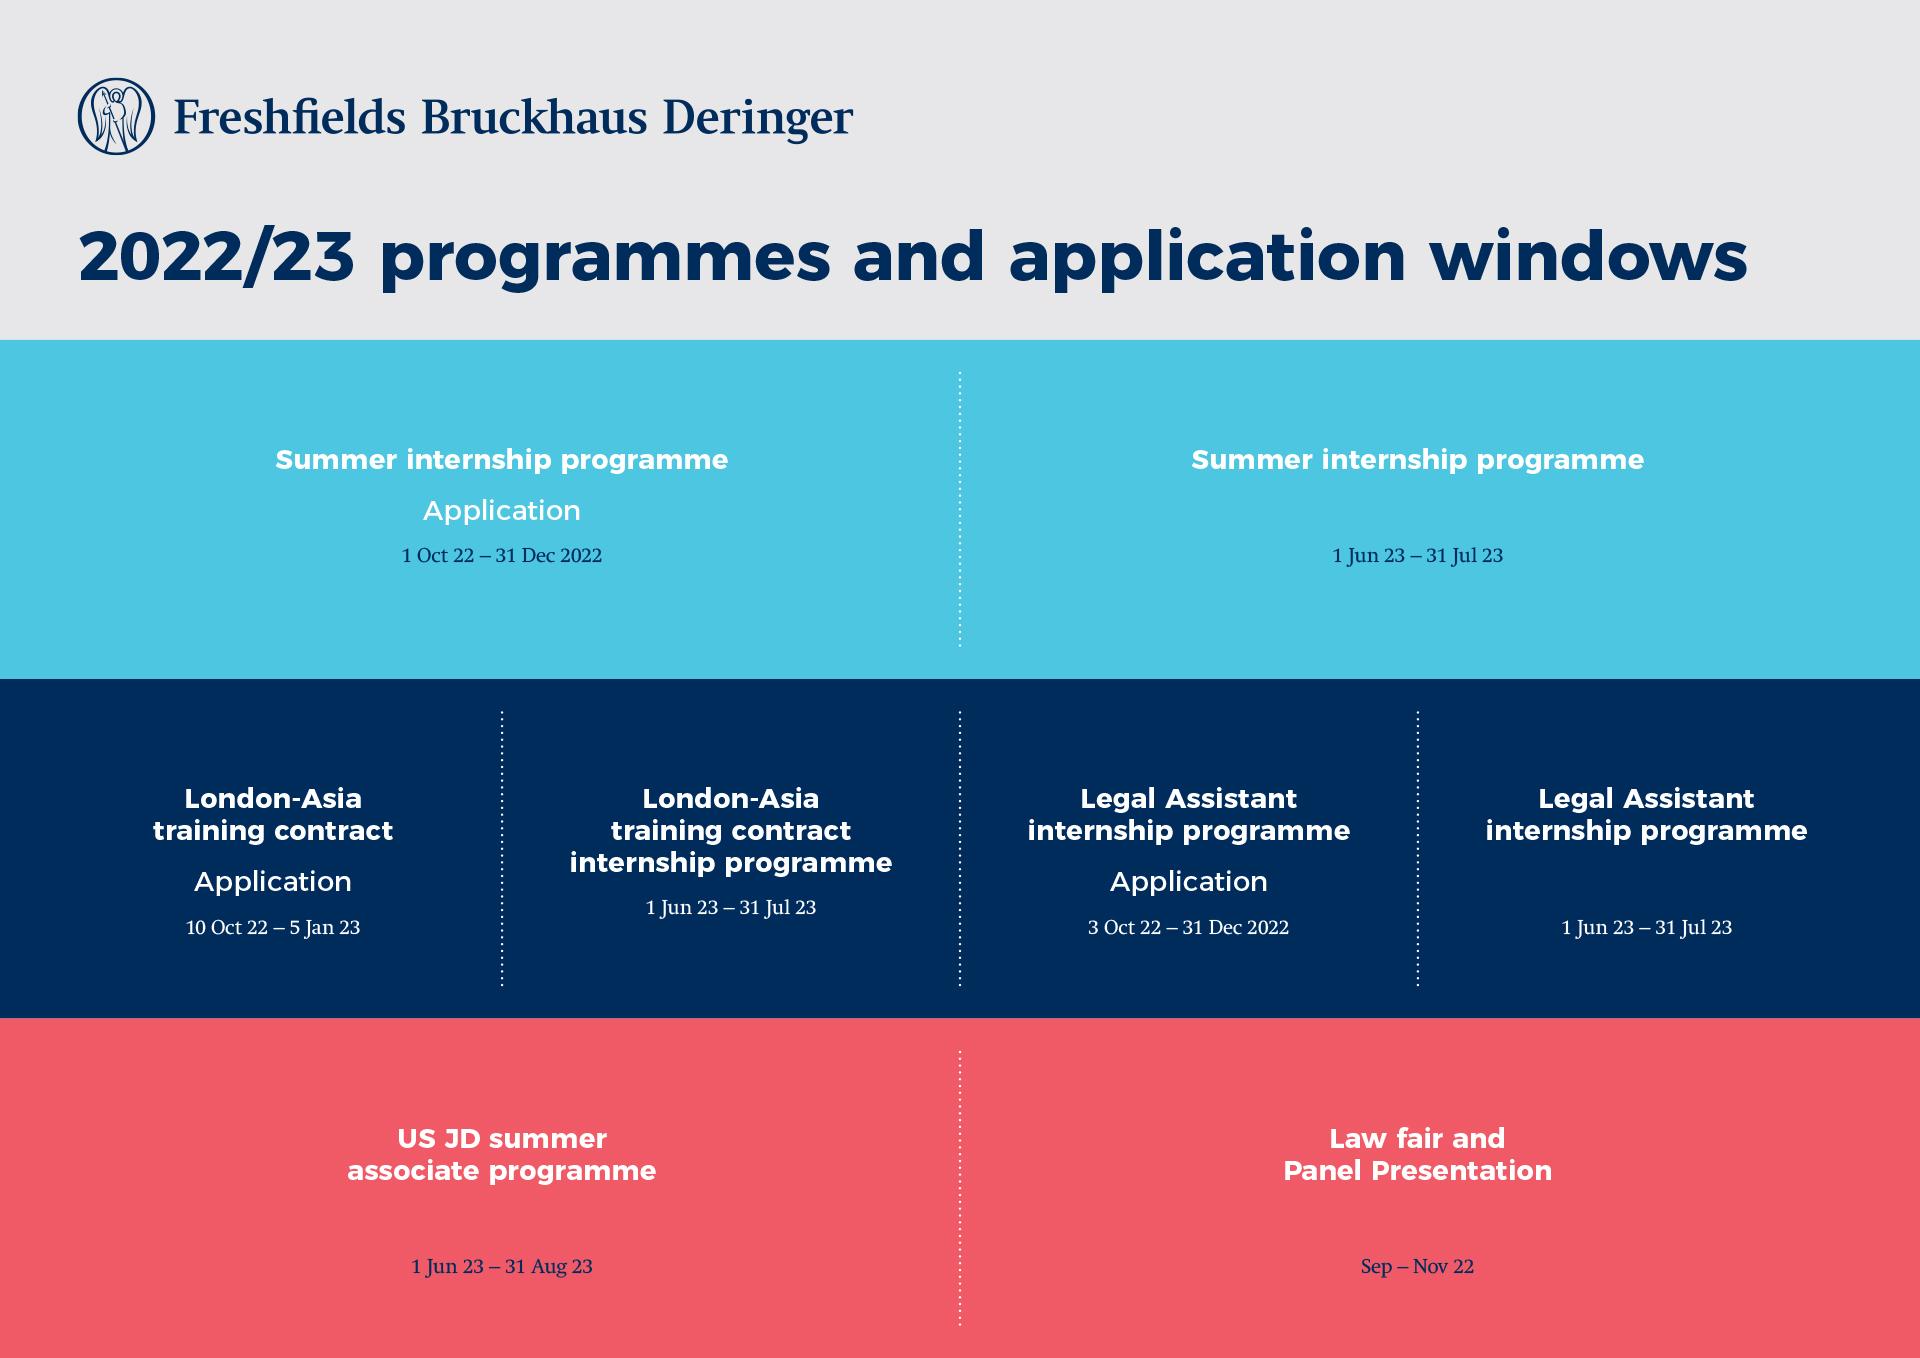 Application windows 2021-22 timeline